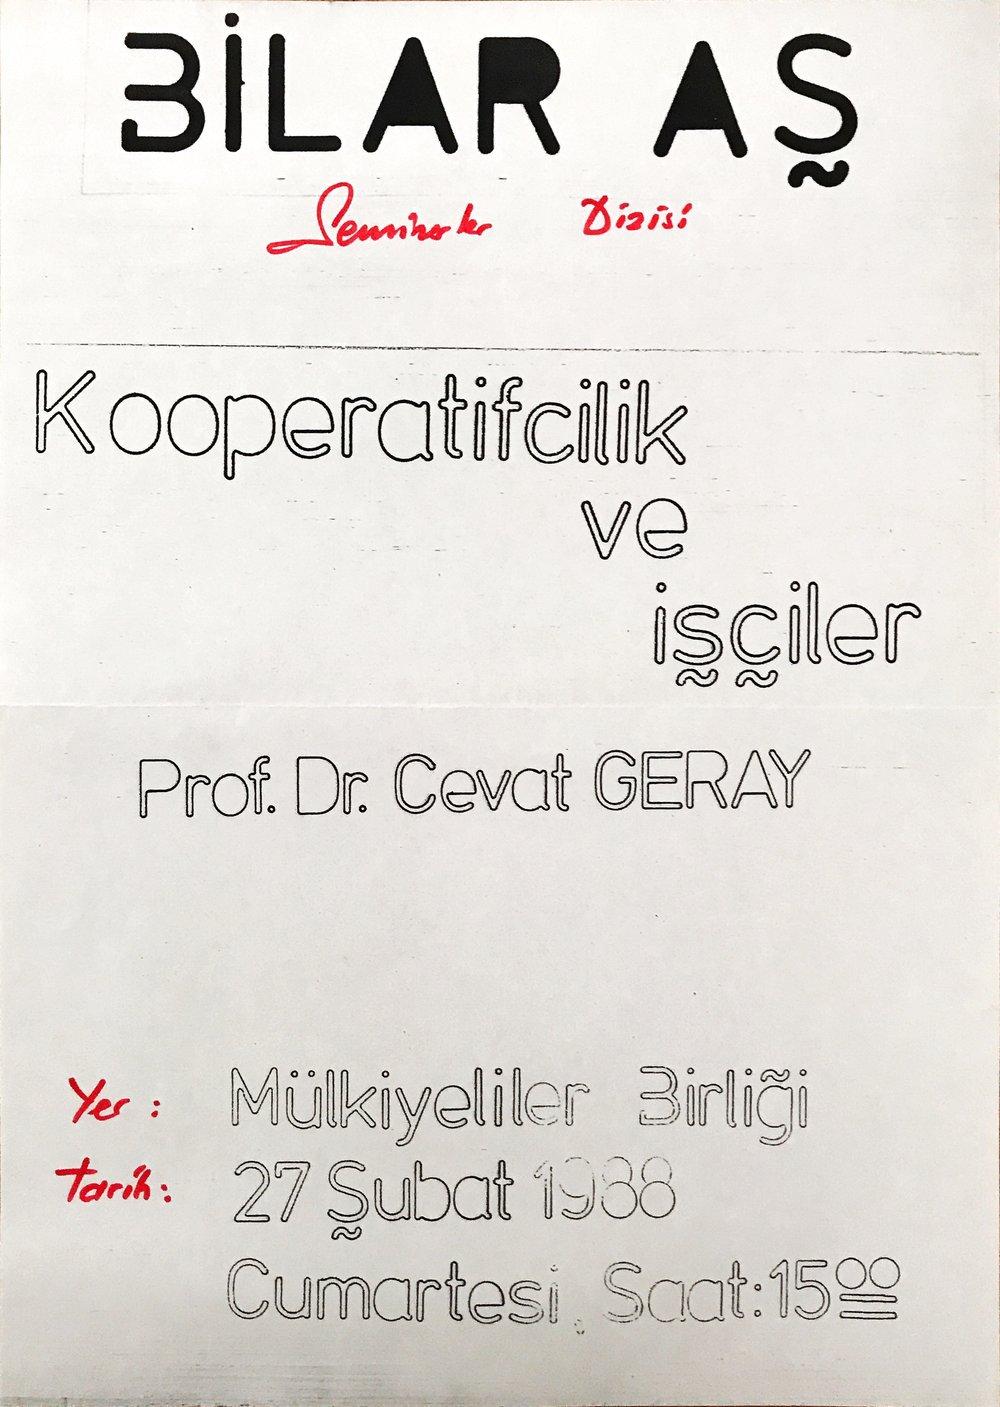 afis-1988-02-27-kooperatifcilik-ve-isciler-cevat-geray-seminer-halukgergerarsivi.JPG